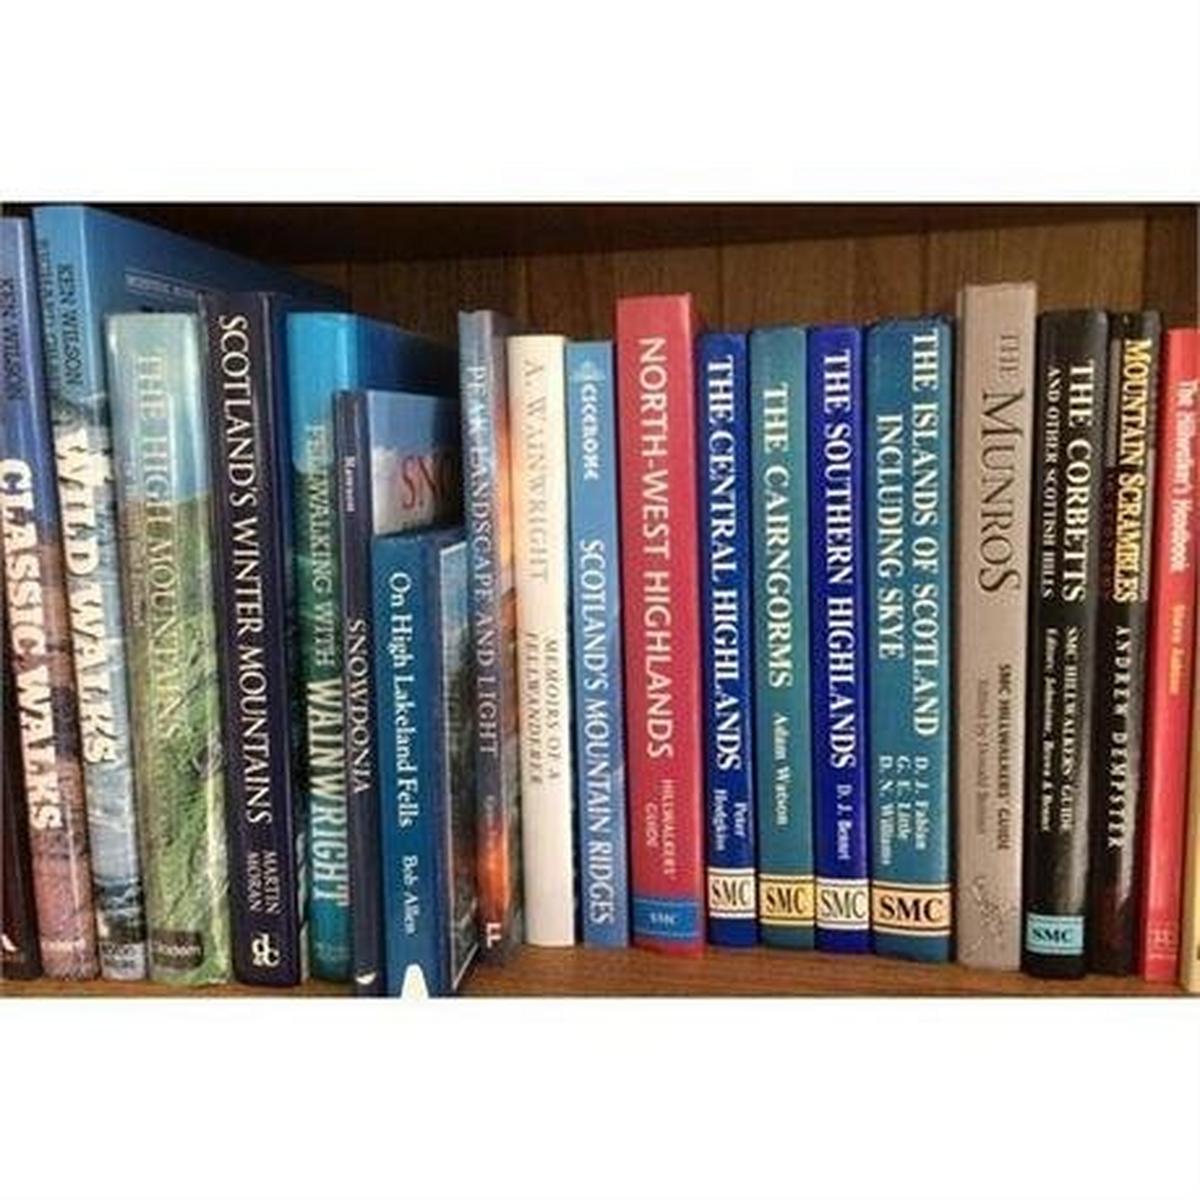 Cordee SMC Climbing Guide Book: Skye - The Cuillin